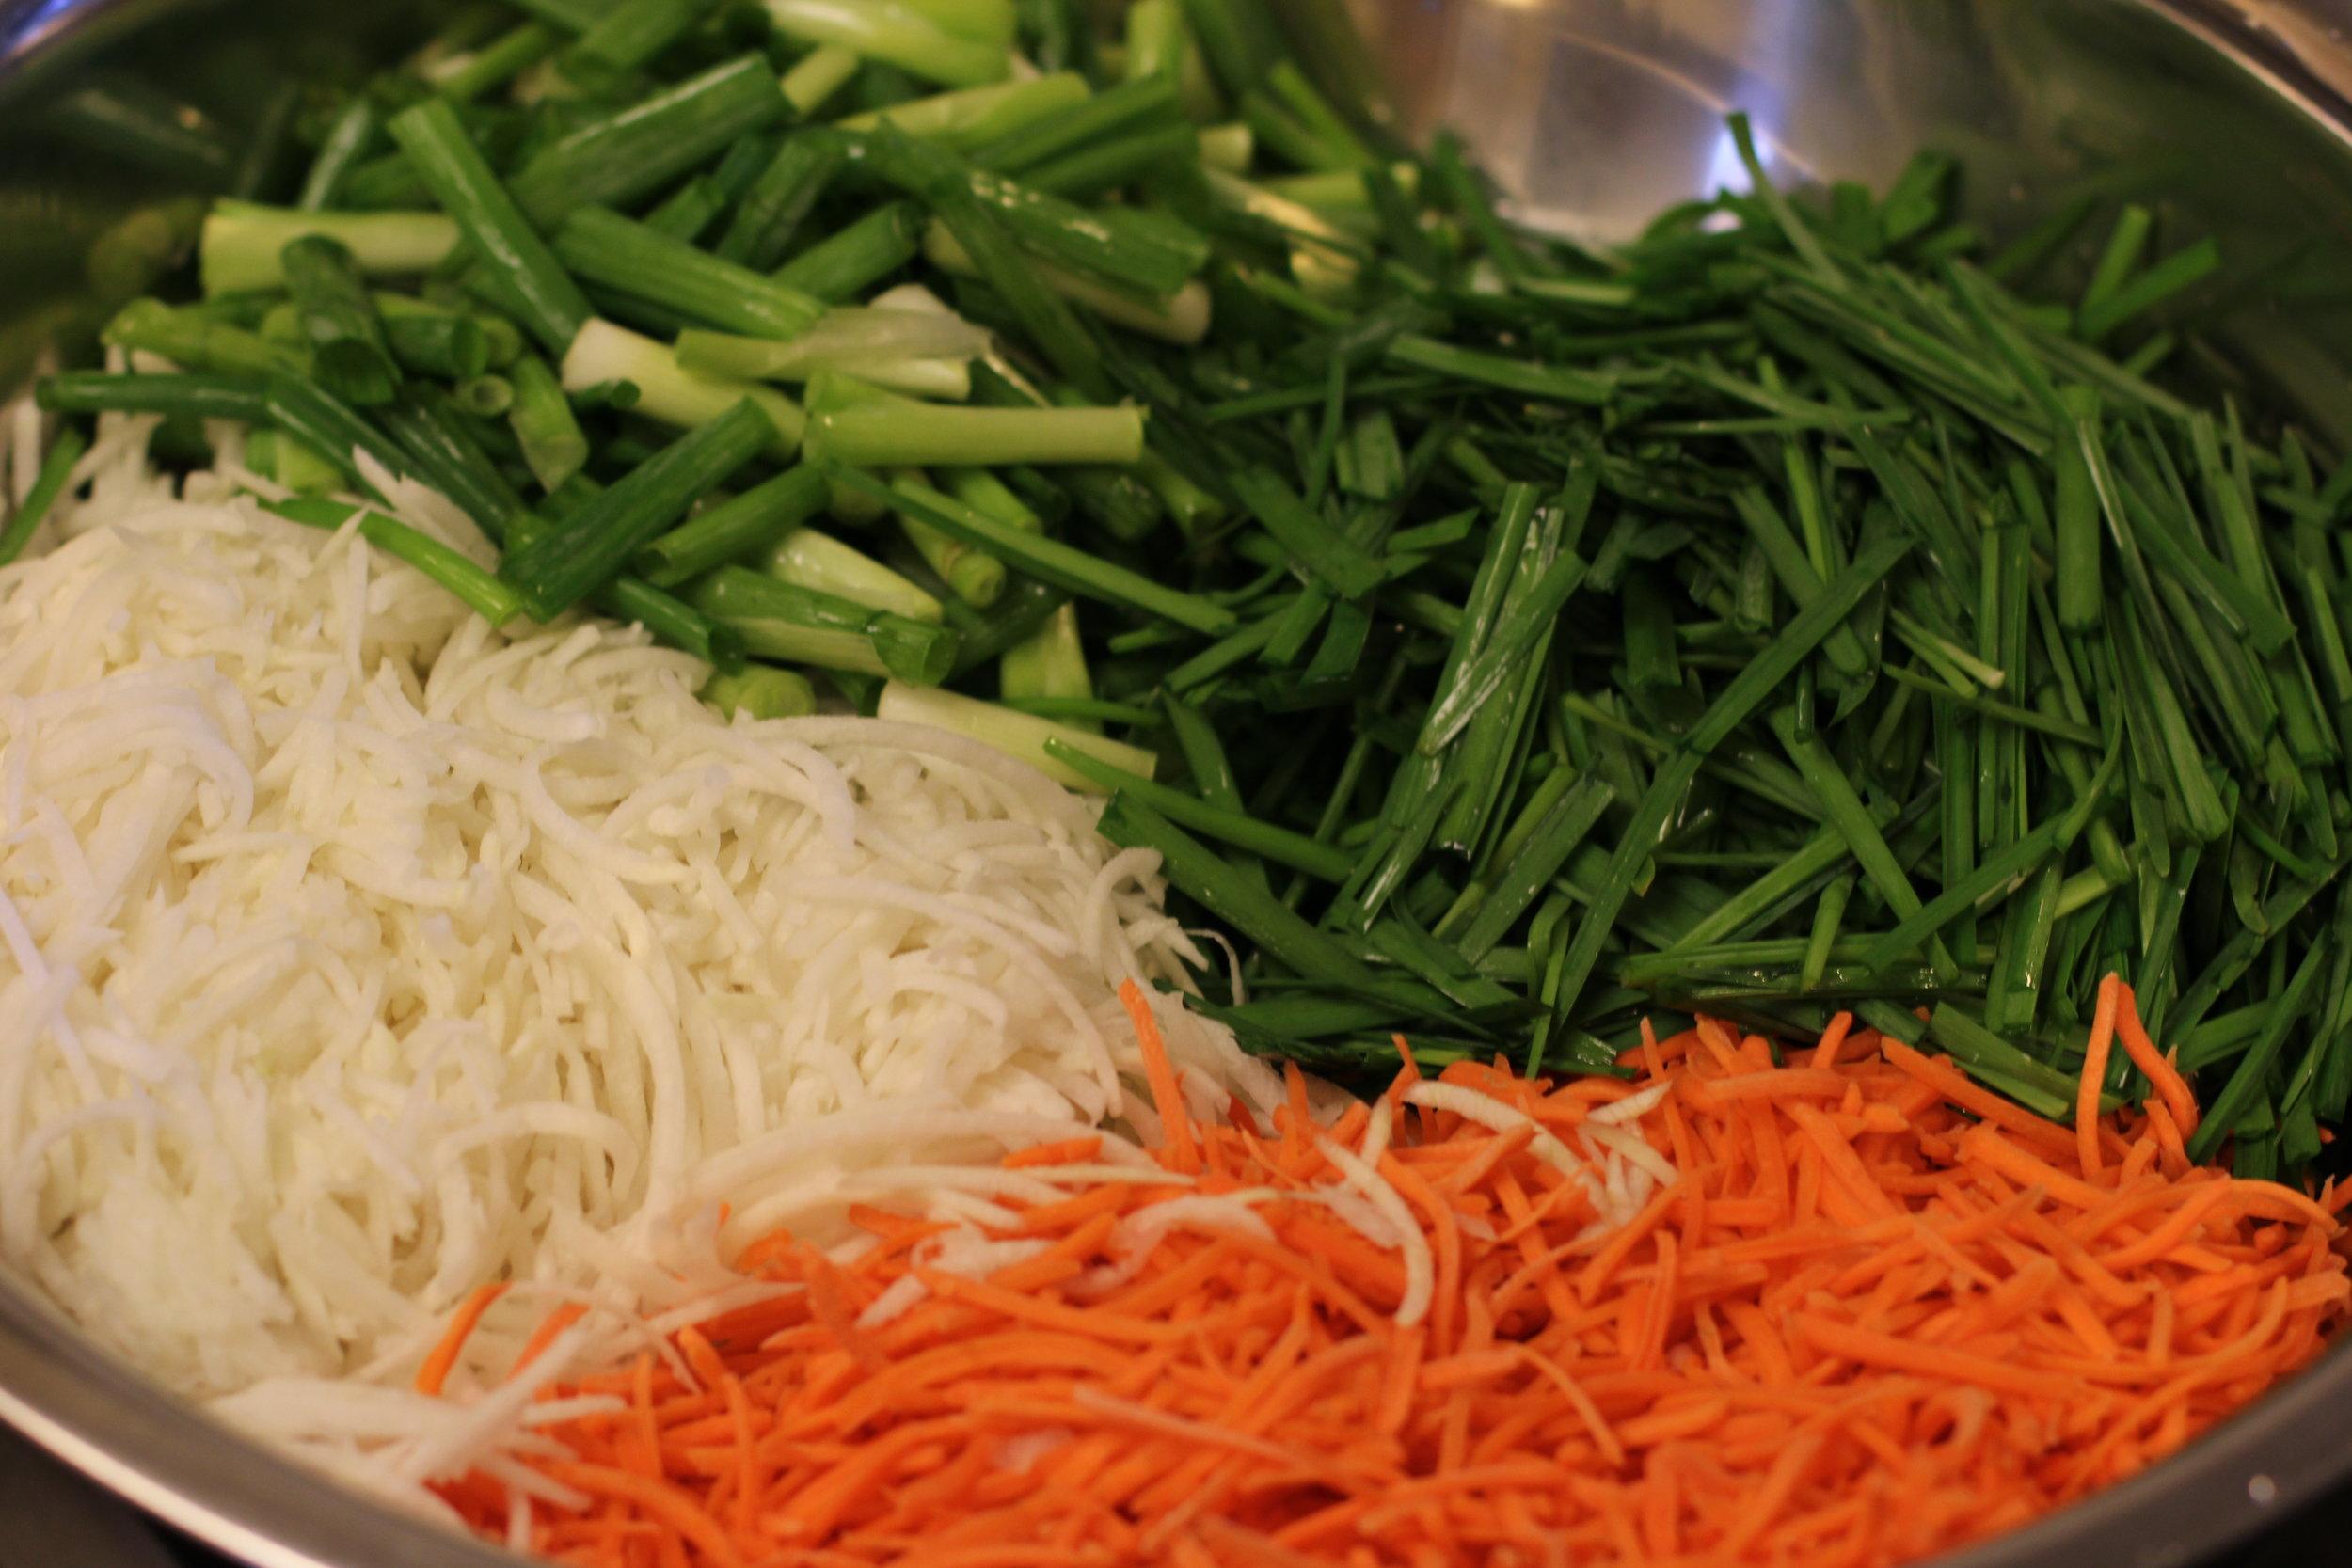 Korean Radish, Carrots, Green Onions and Asian Chives